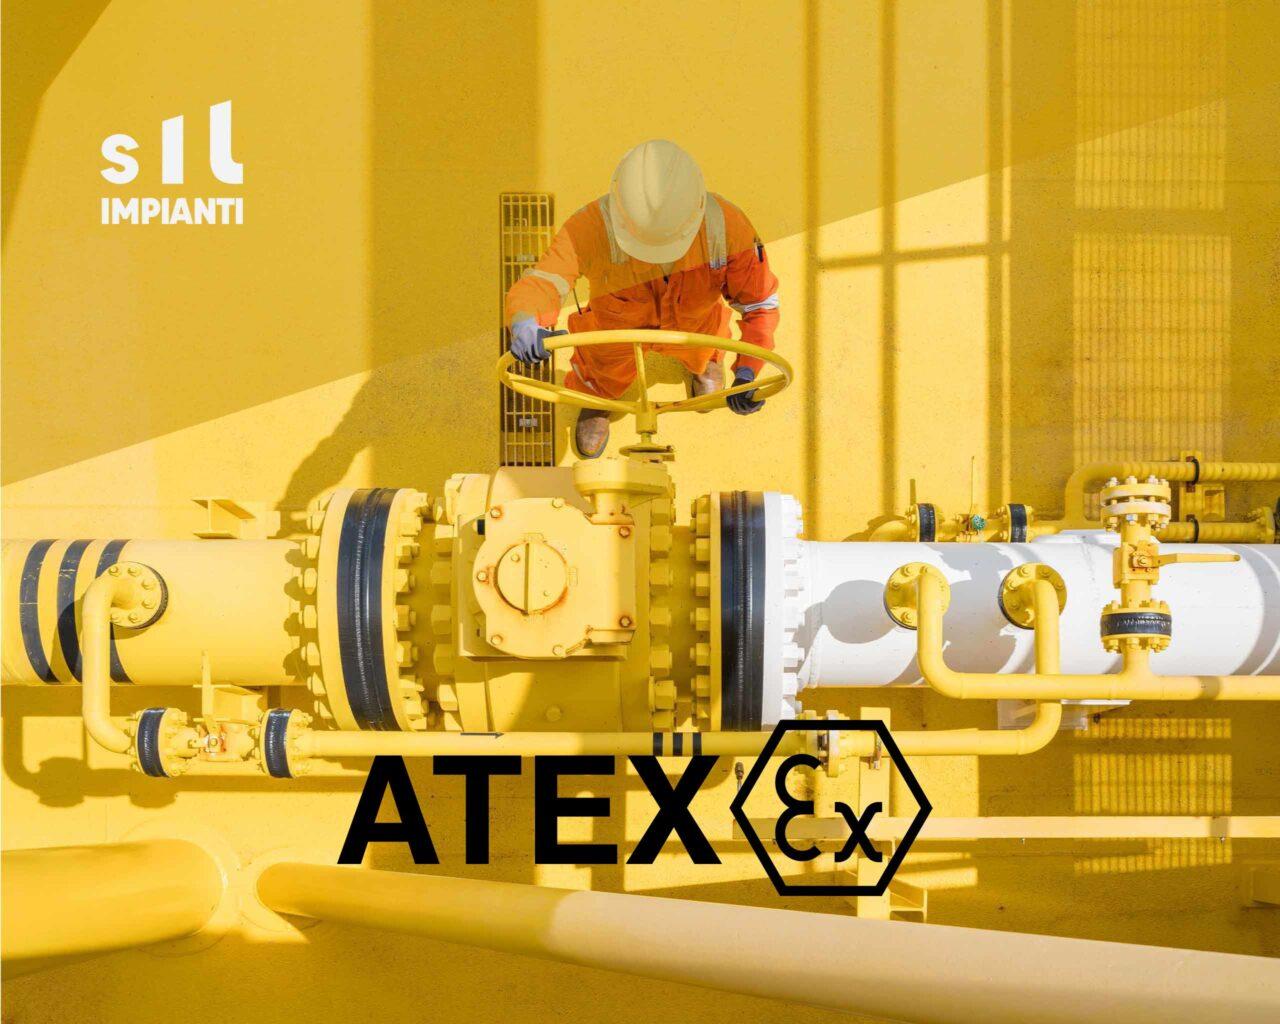 atex_sil-impianti